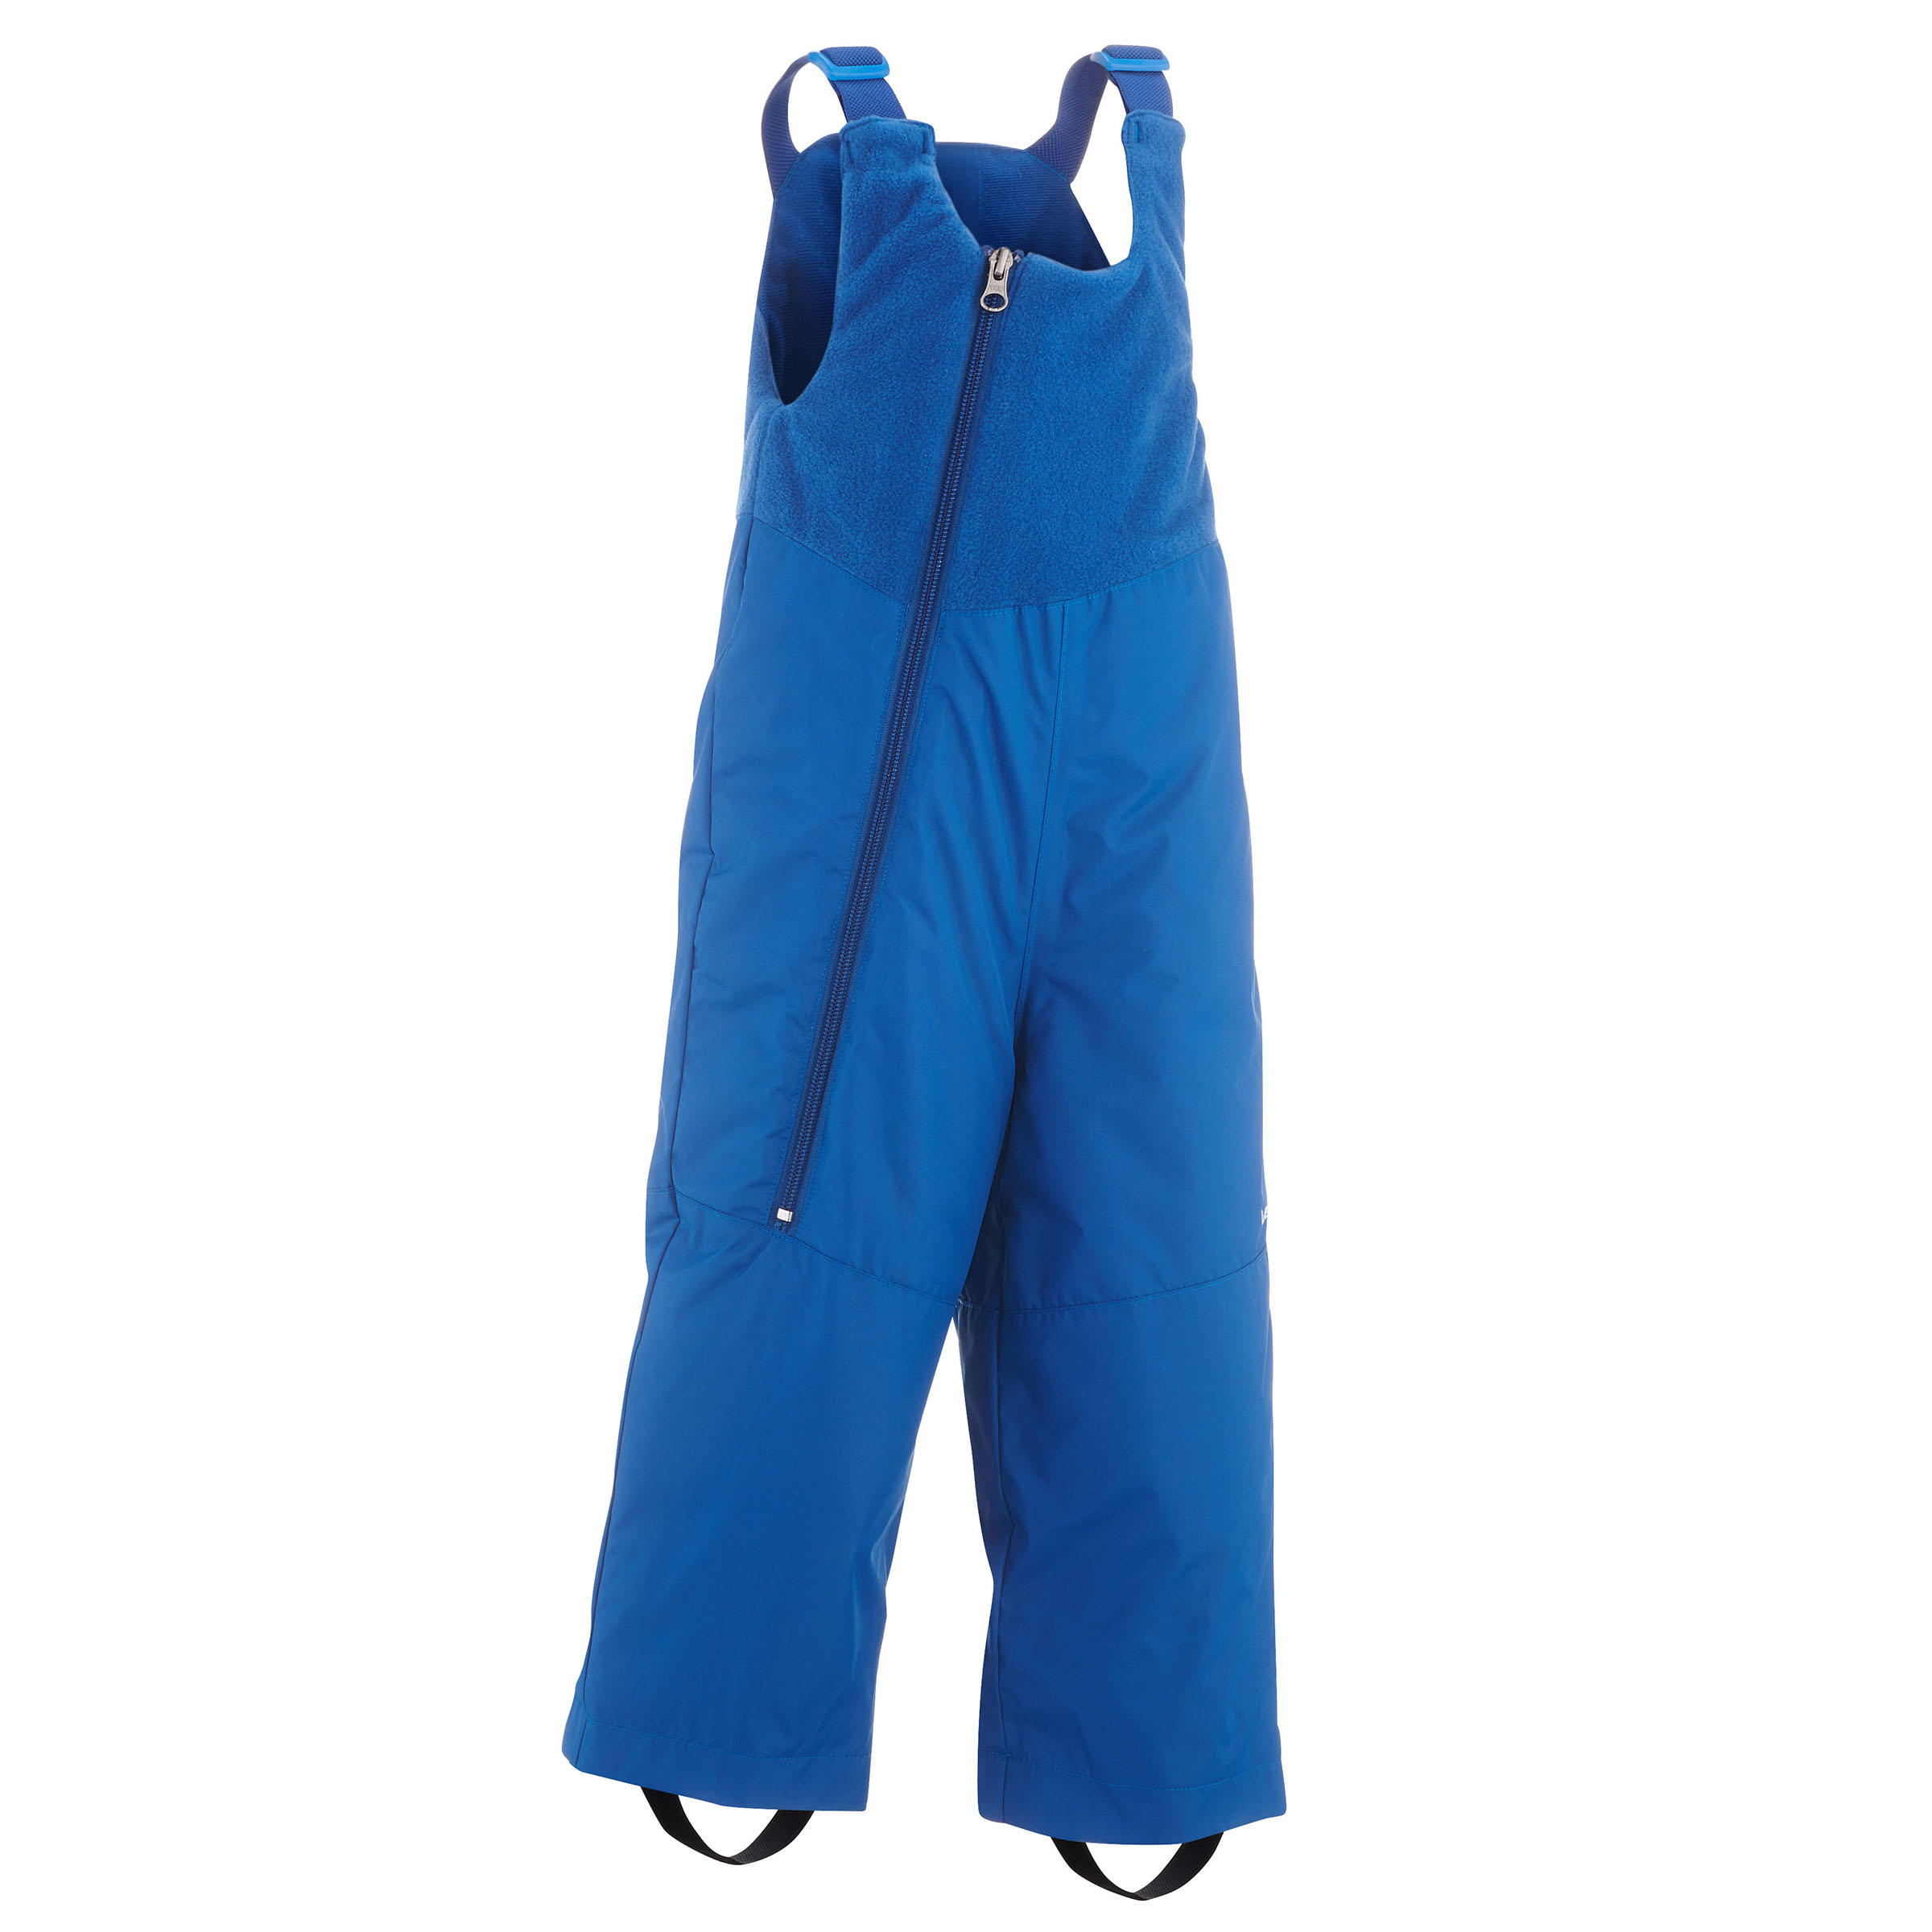 Warm Babies' Sledding Snow Pants - Blue